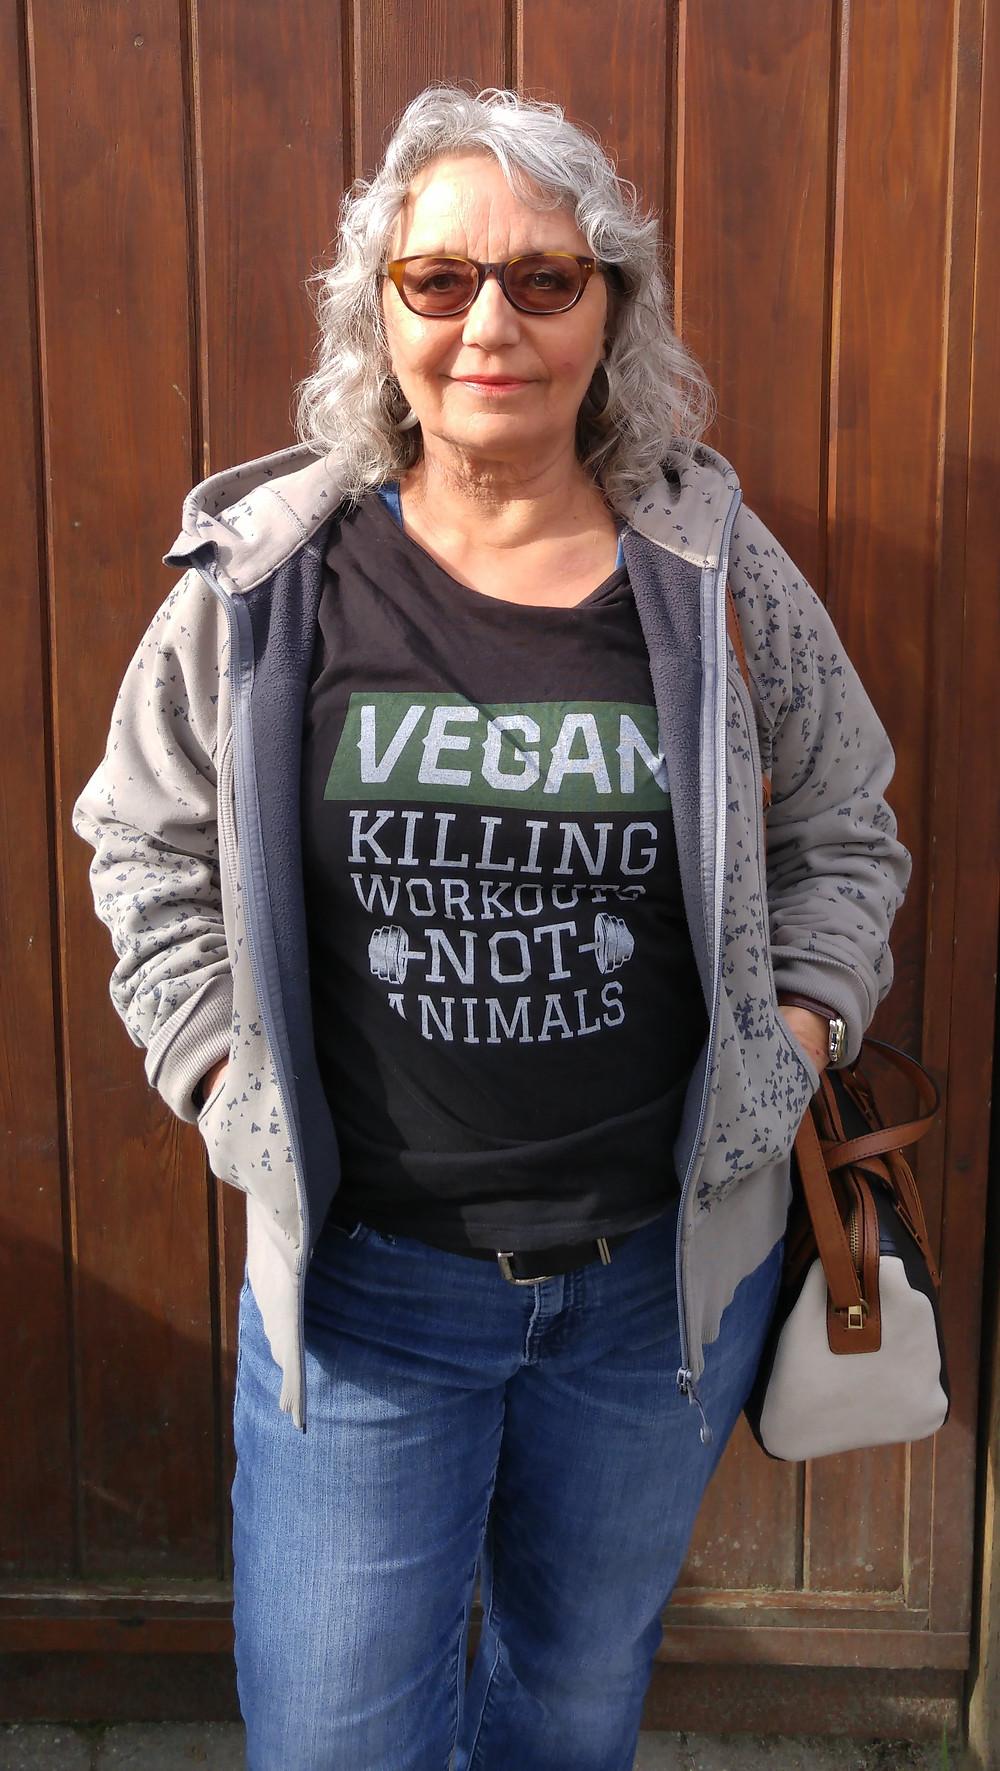 Vegan lawyer Pat Kendall